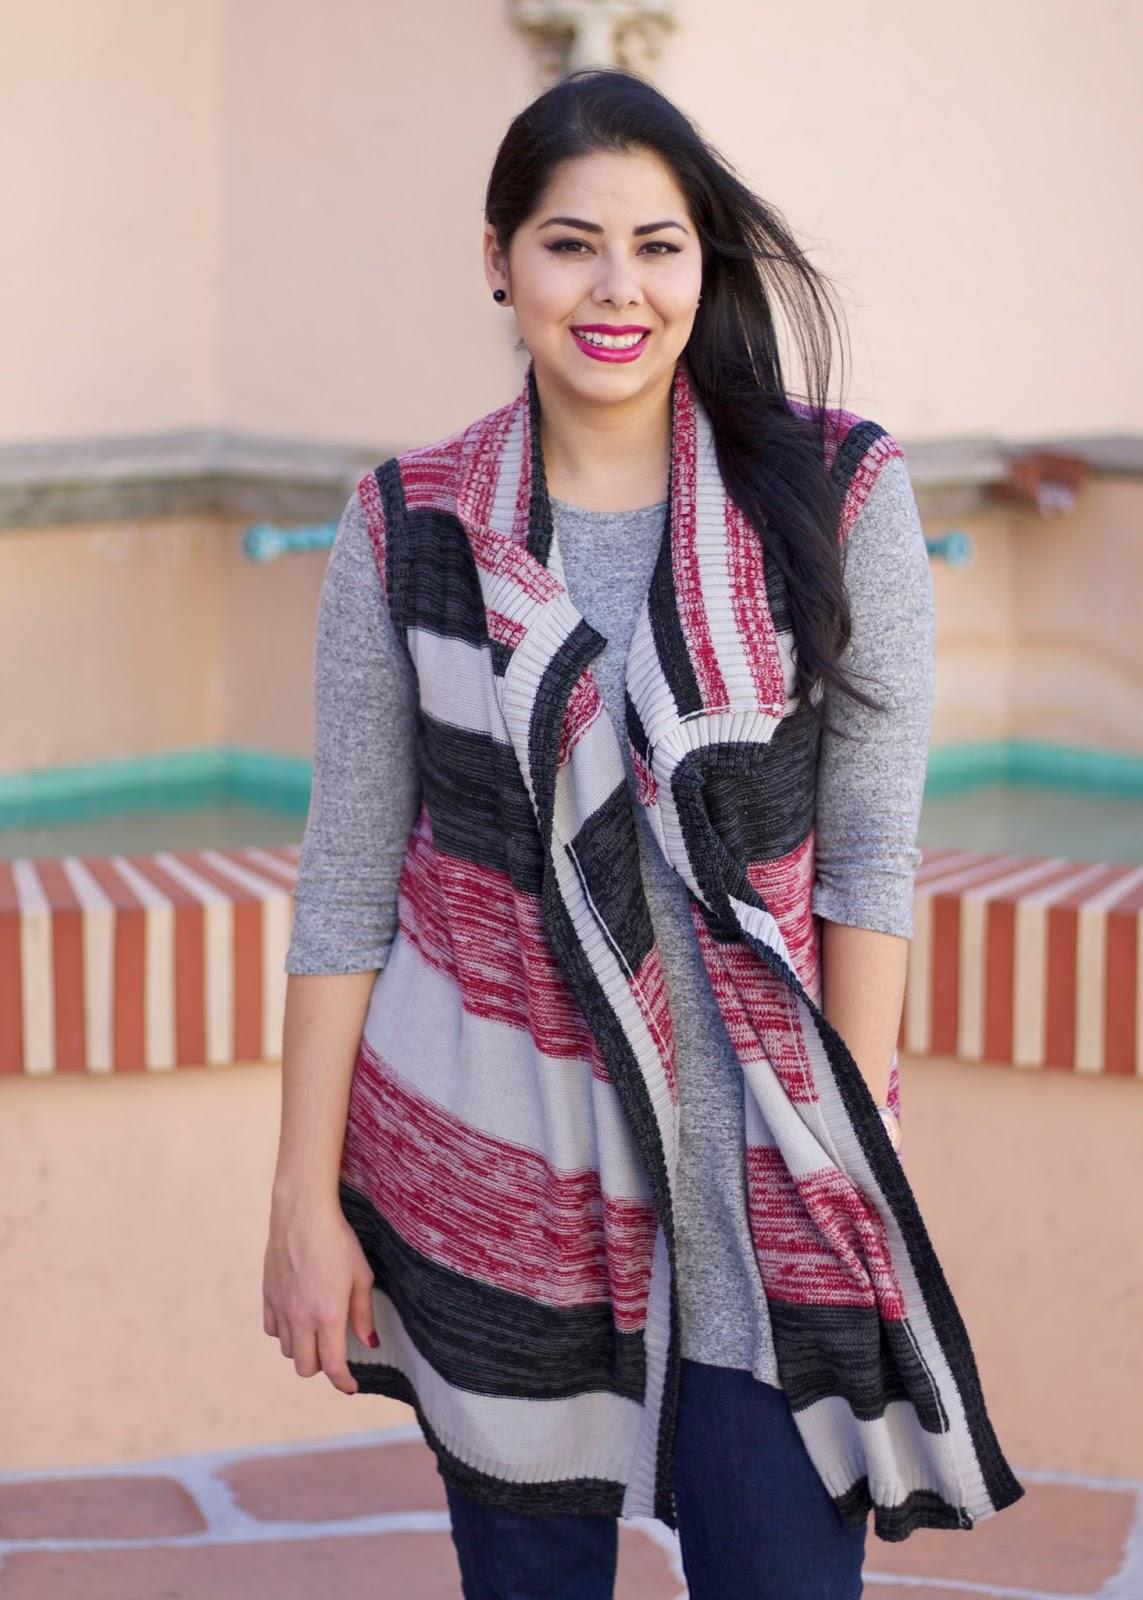 Latina Fashion Blogger, Latina Style Blogger, Mexican Fashion Blogger, brunette blogger, knitted vest for Fall